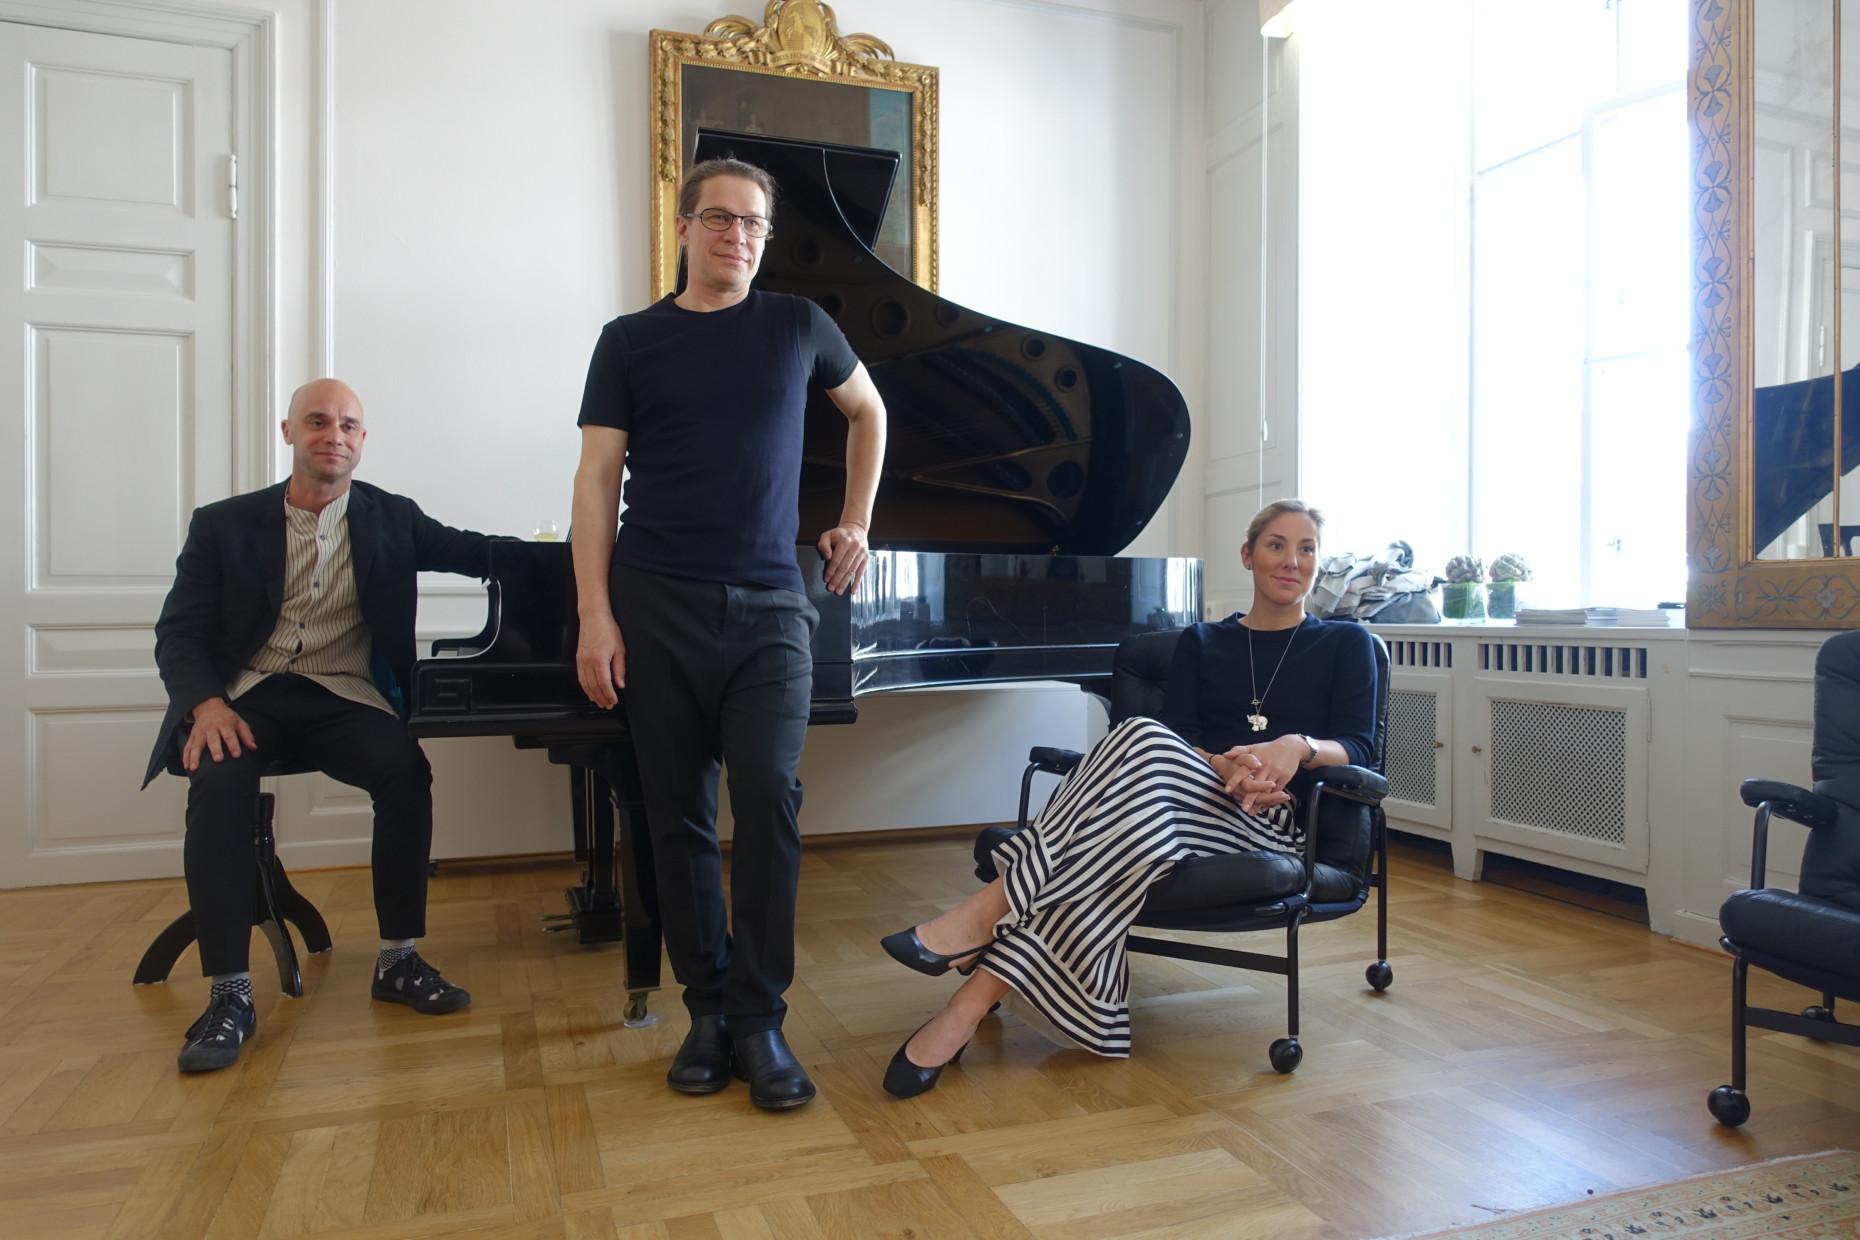 Mårten Claesson and Ola Rune from Claesson Koivisto Rune and DUX President Charlotte Ljung